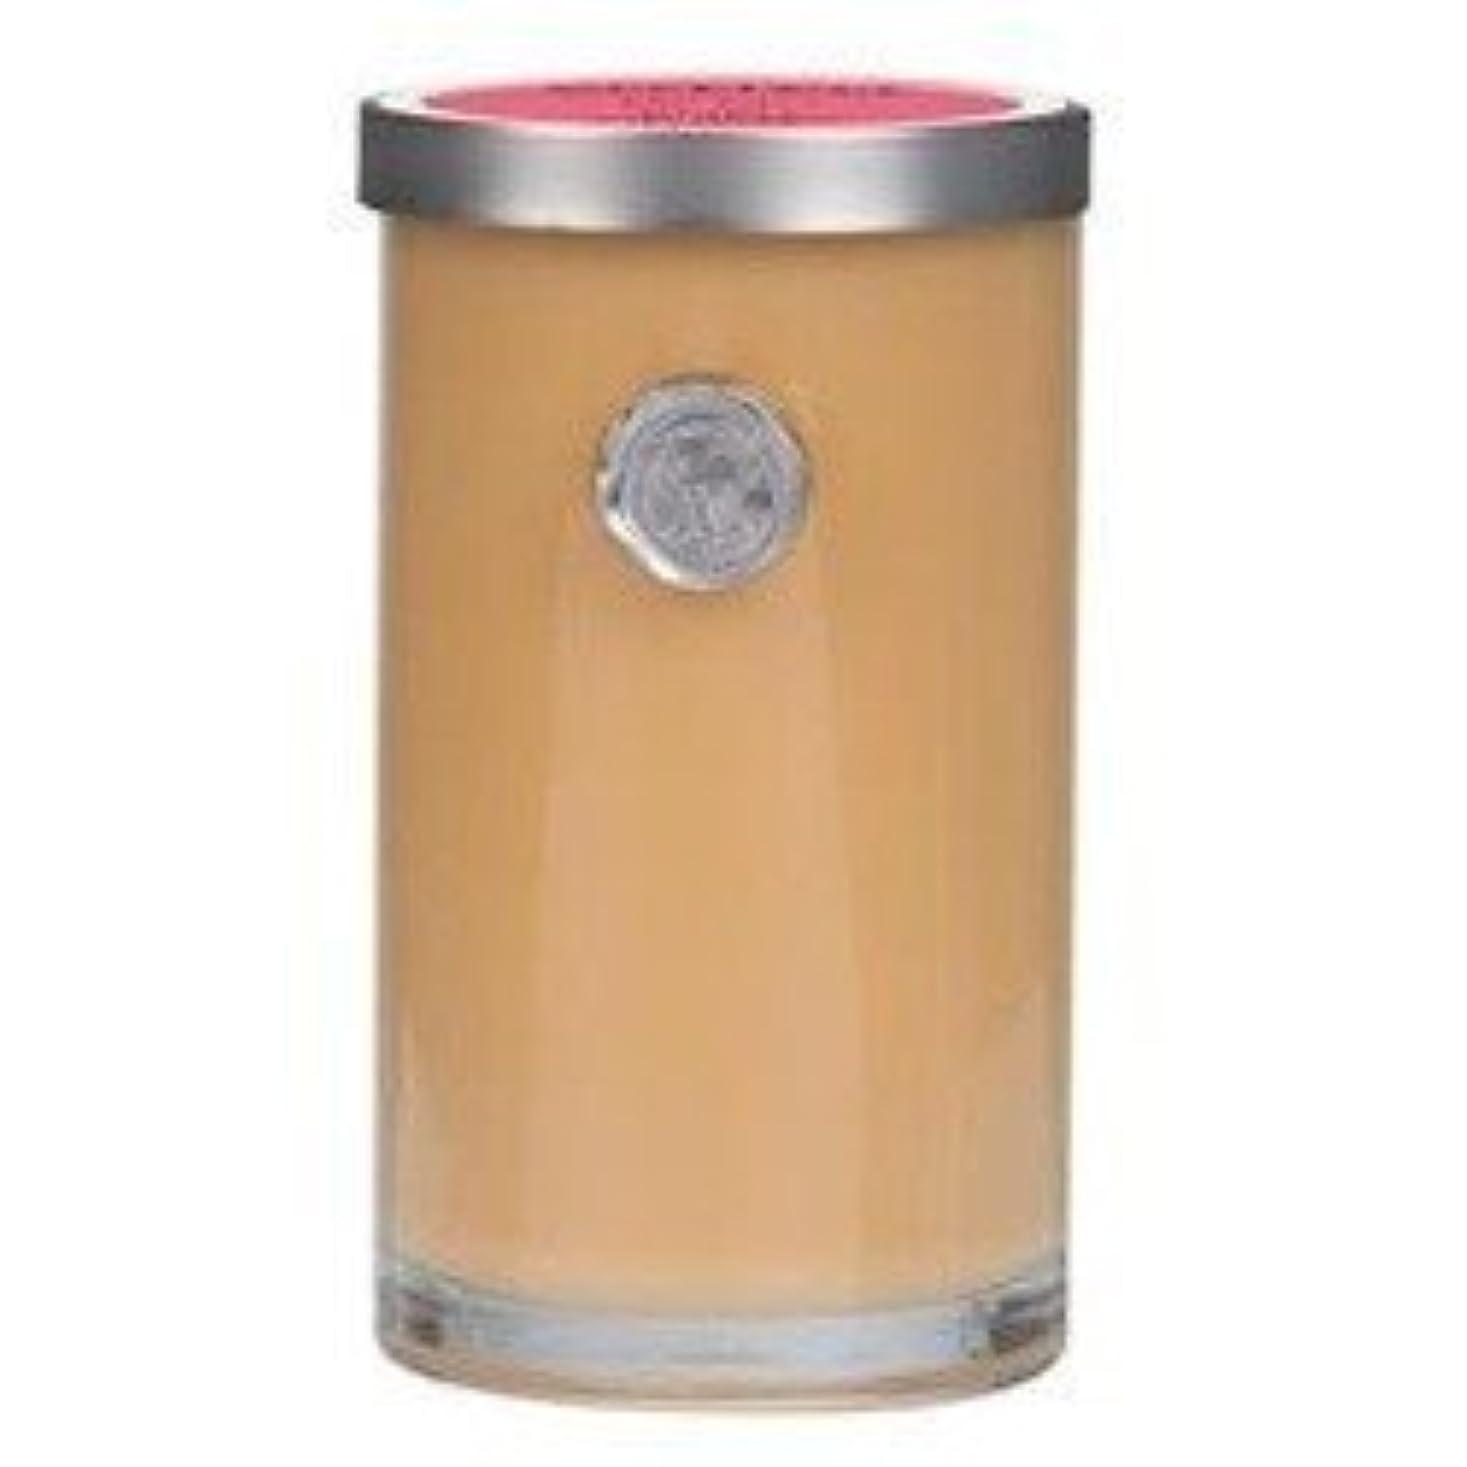 VOTIVO AROMATIC VOTIVE CANDLE RUSH OF ROSE